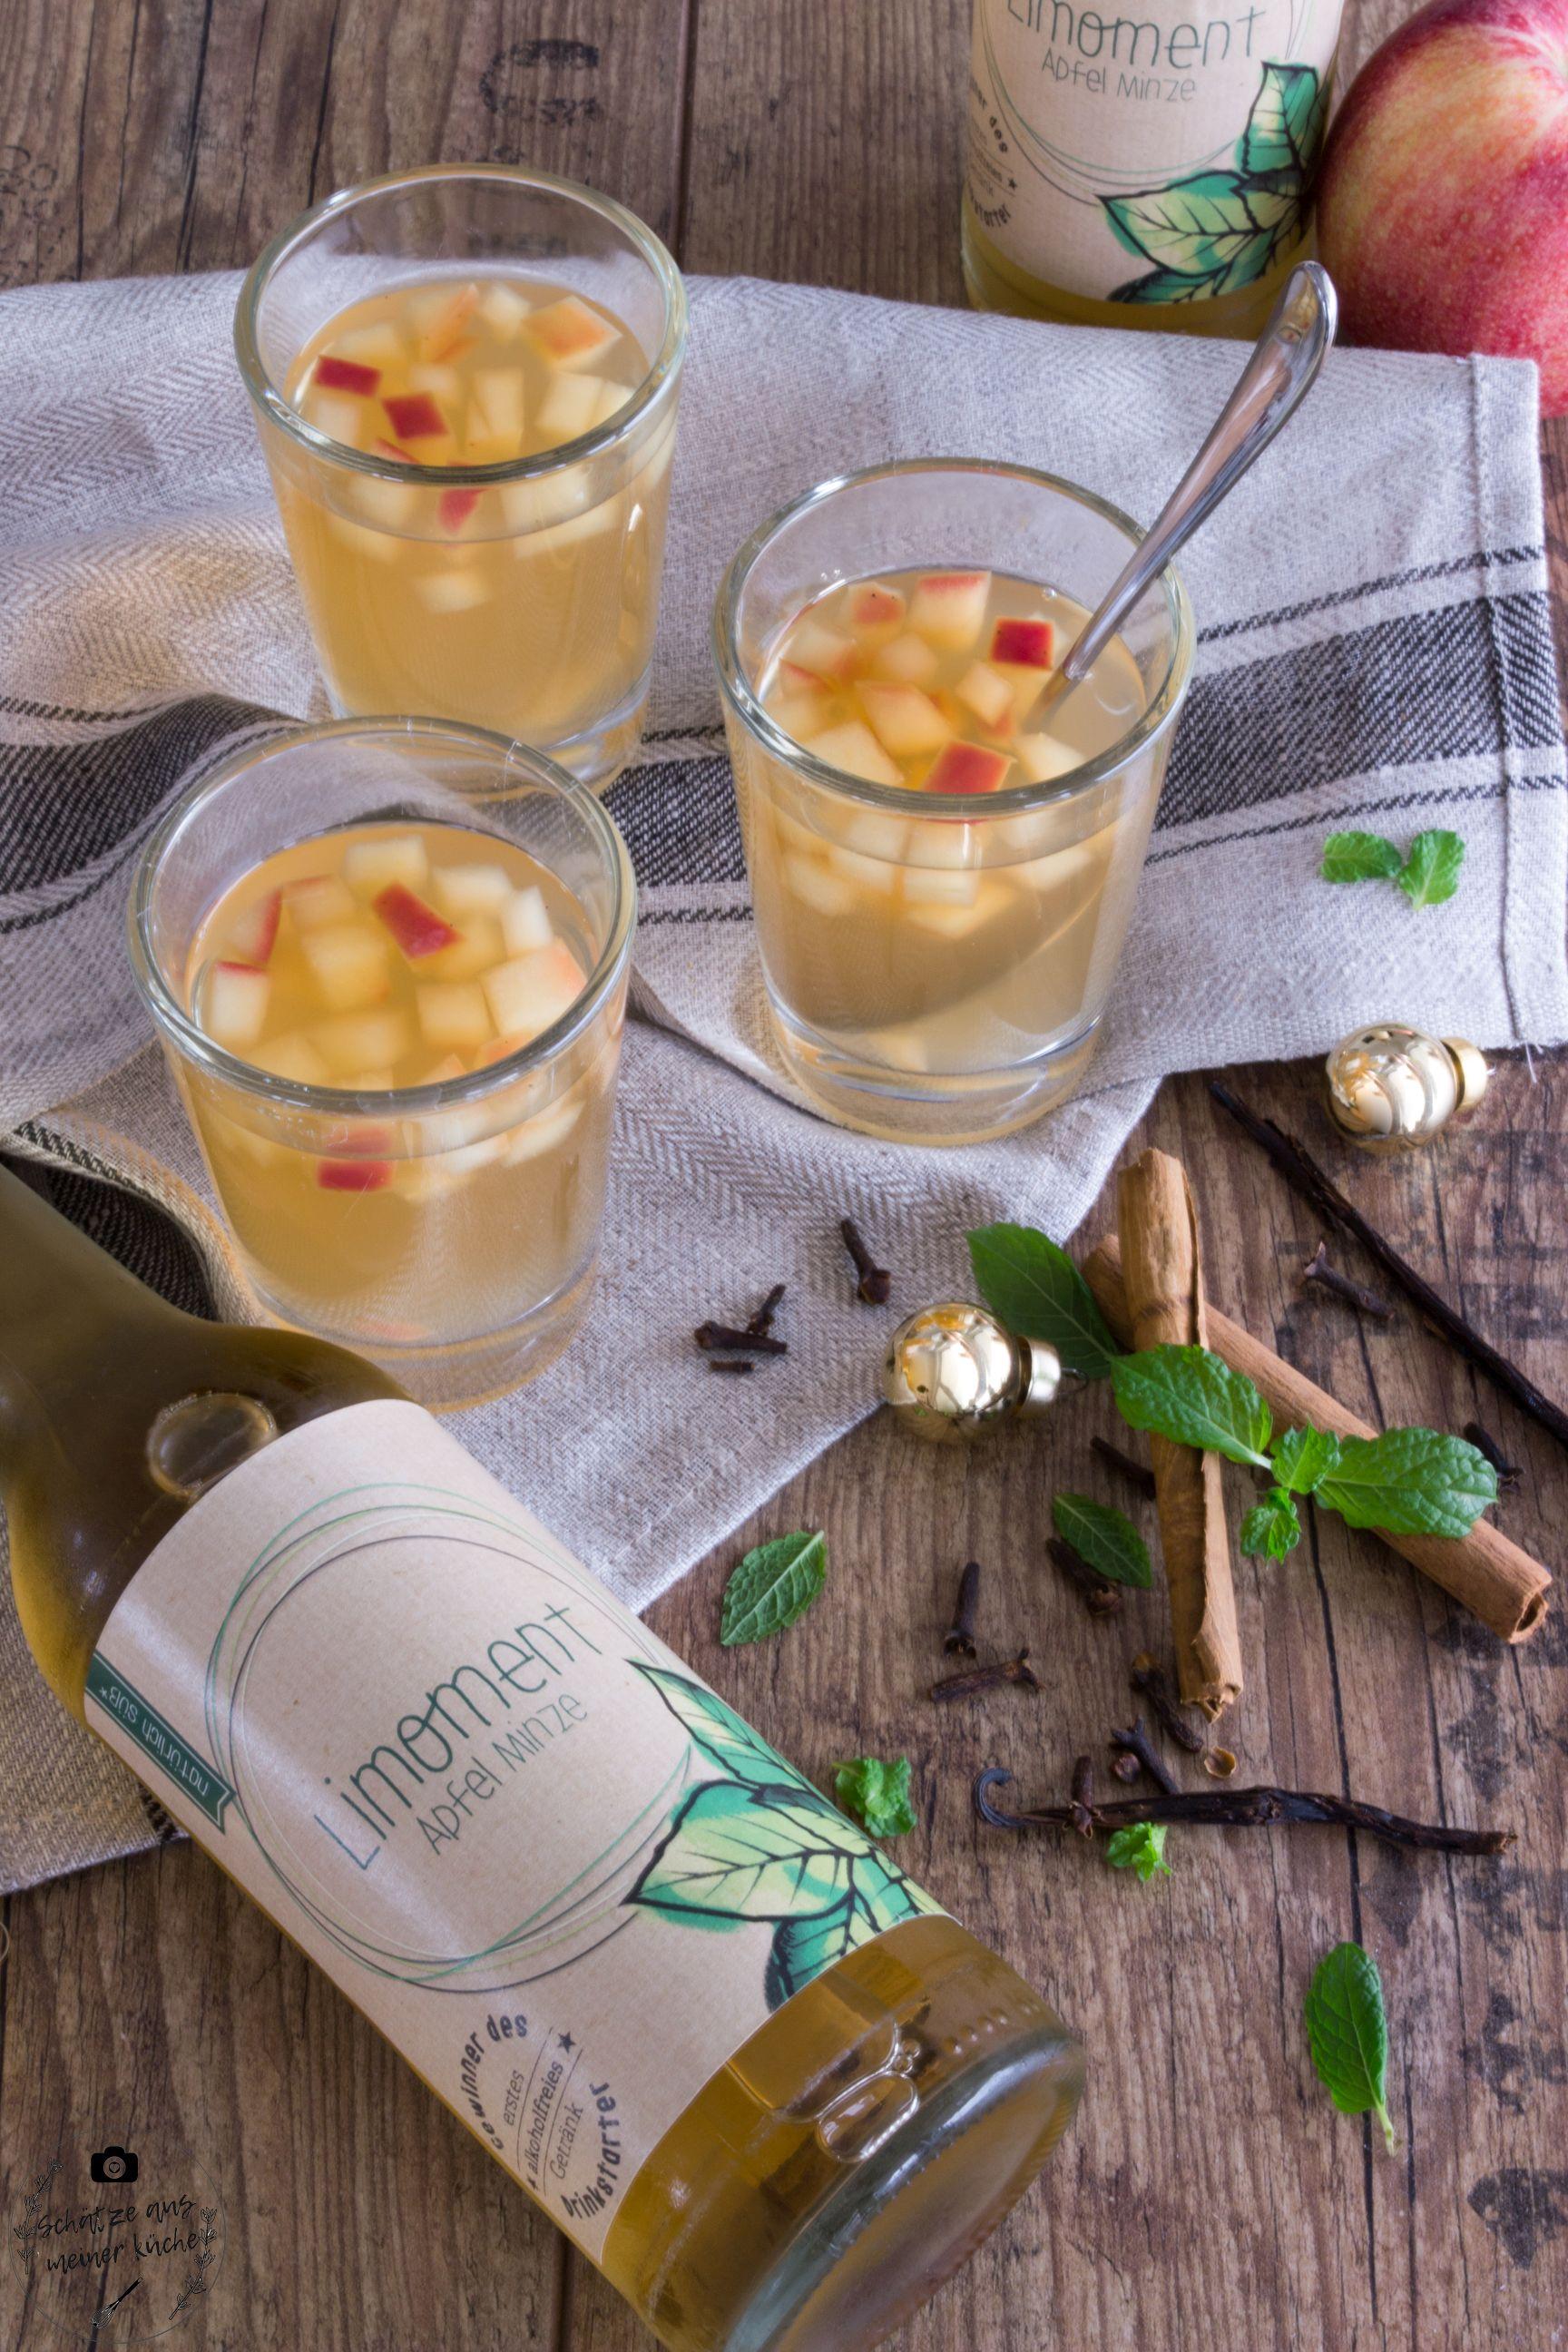 Limoment Apfel-Minze-Limonade Apfelpunsch